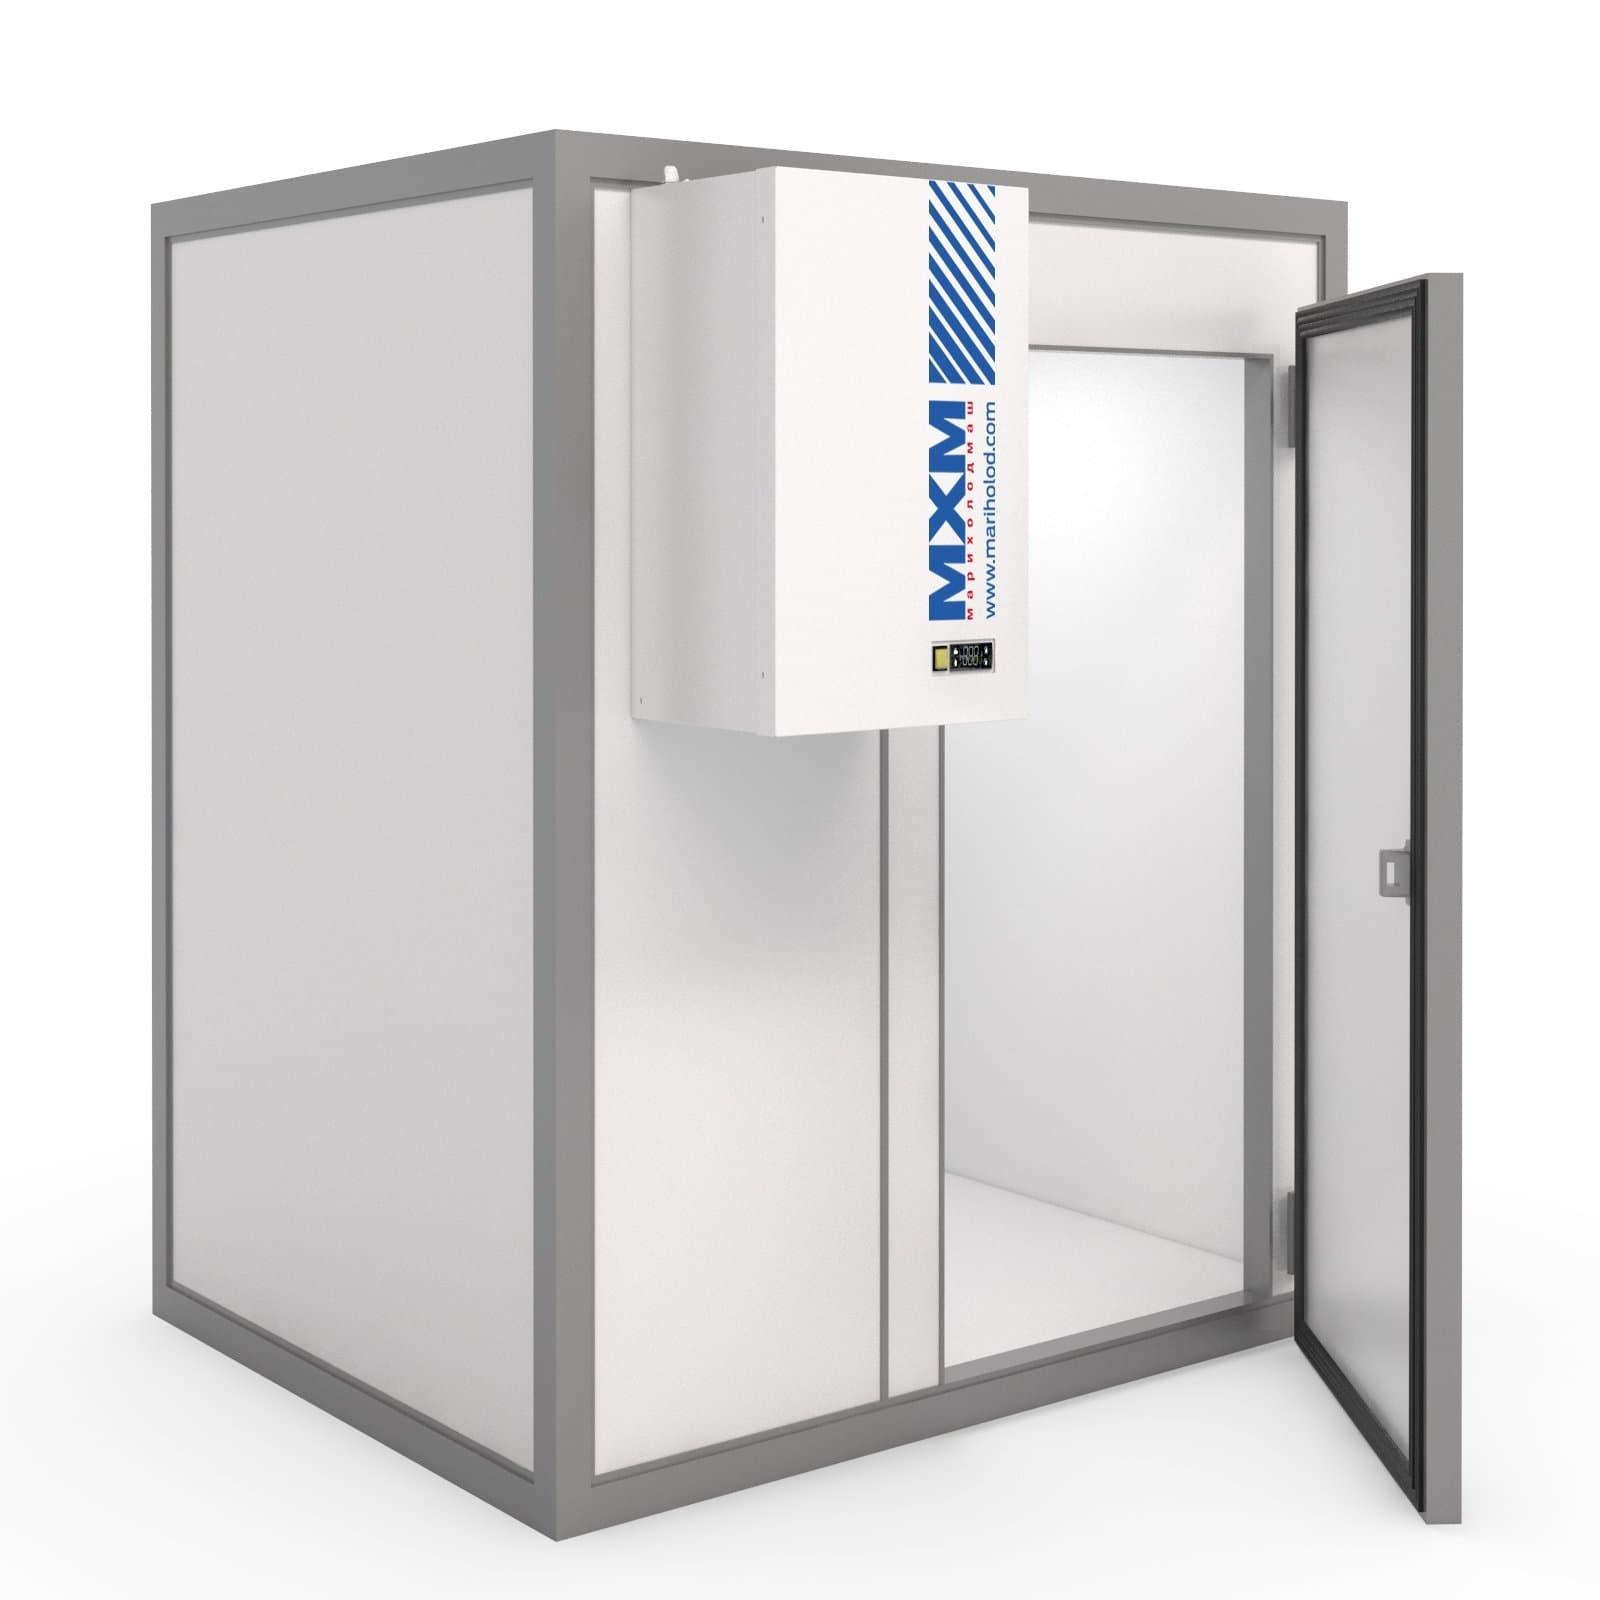 Камера холодильная КХН-86,63 (2560×14260×2720 мм)